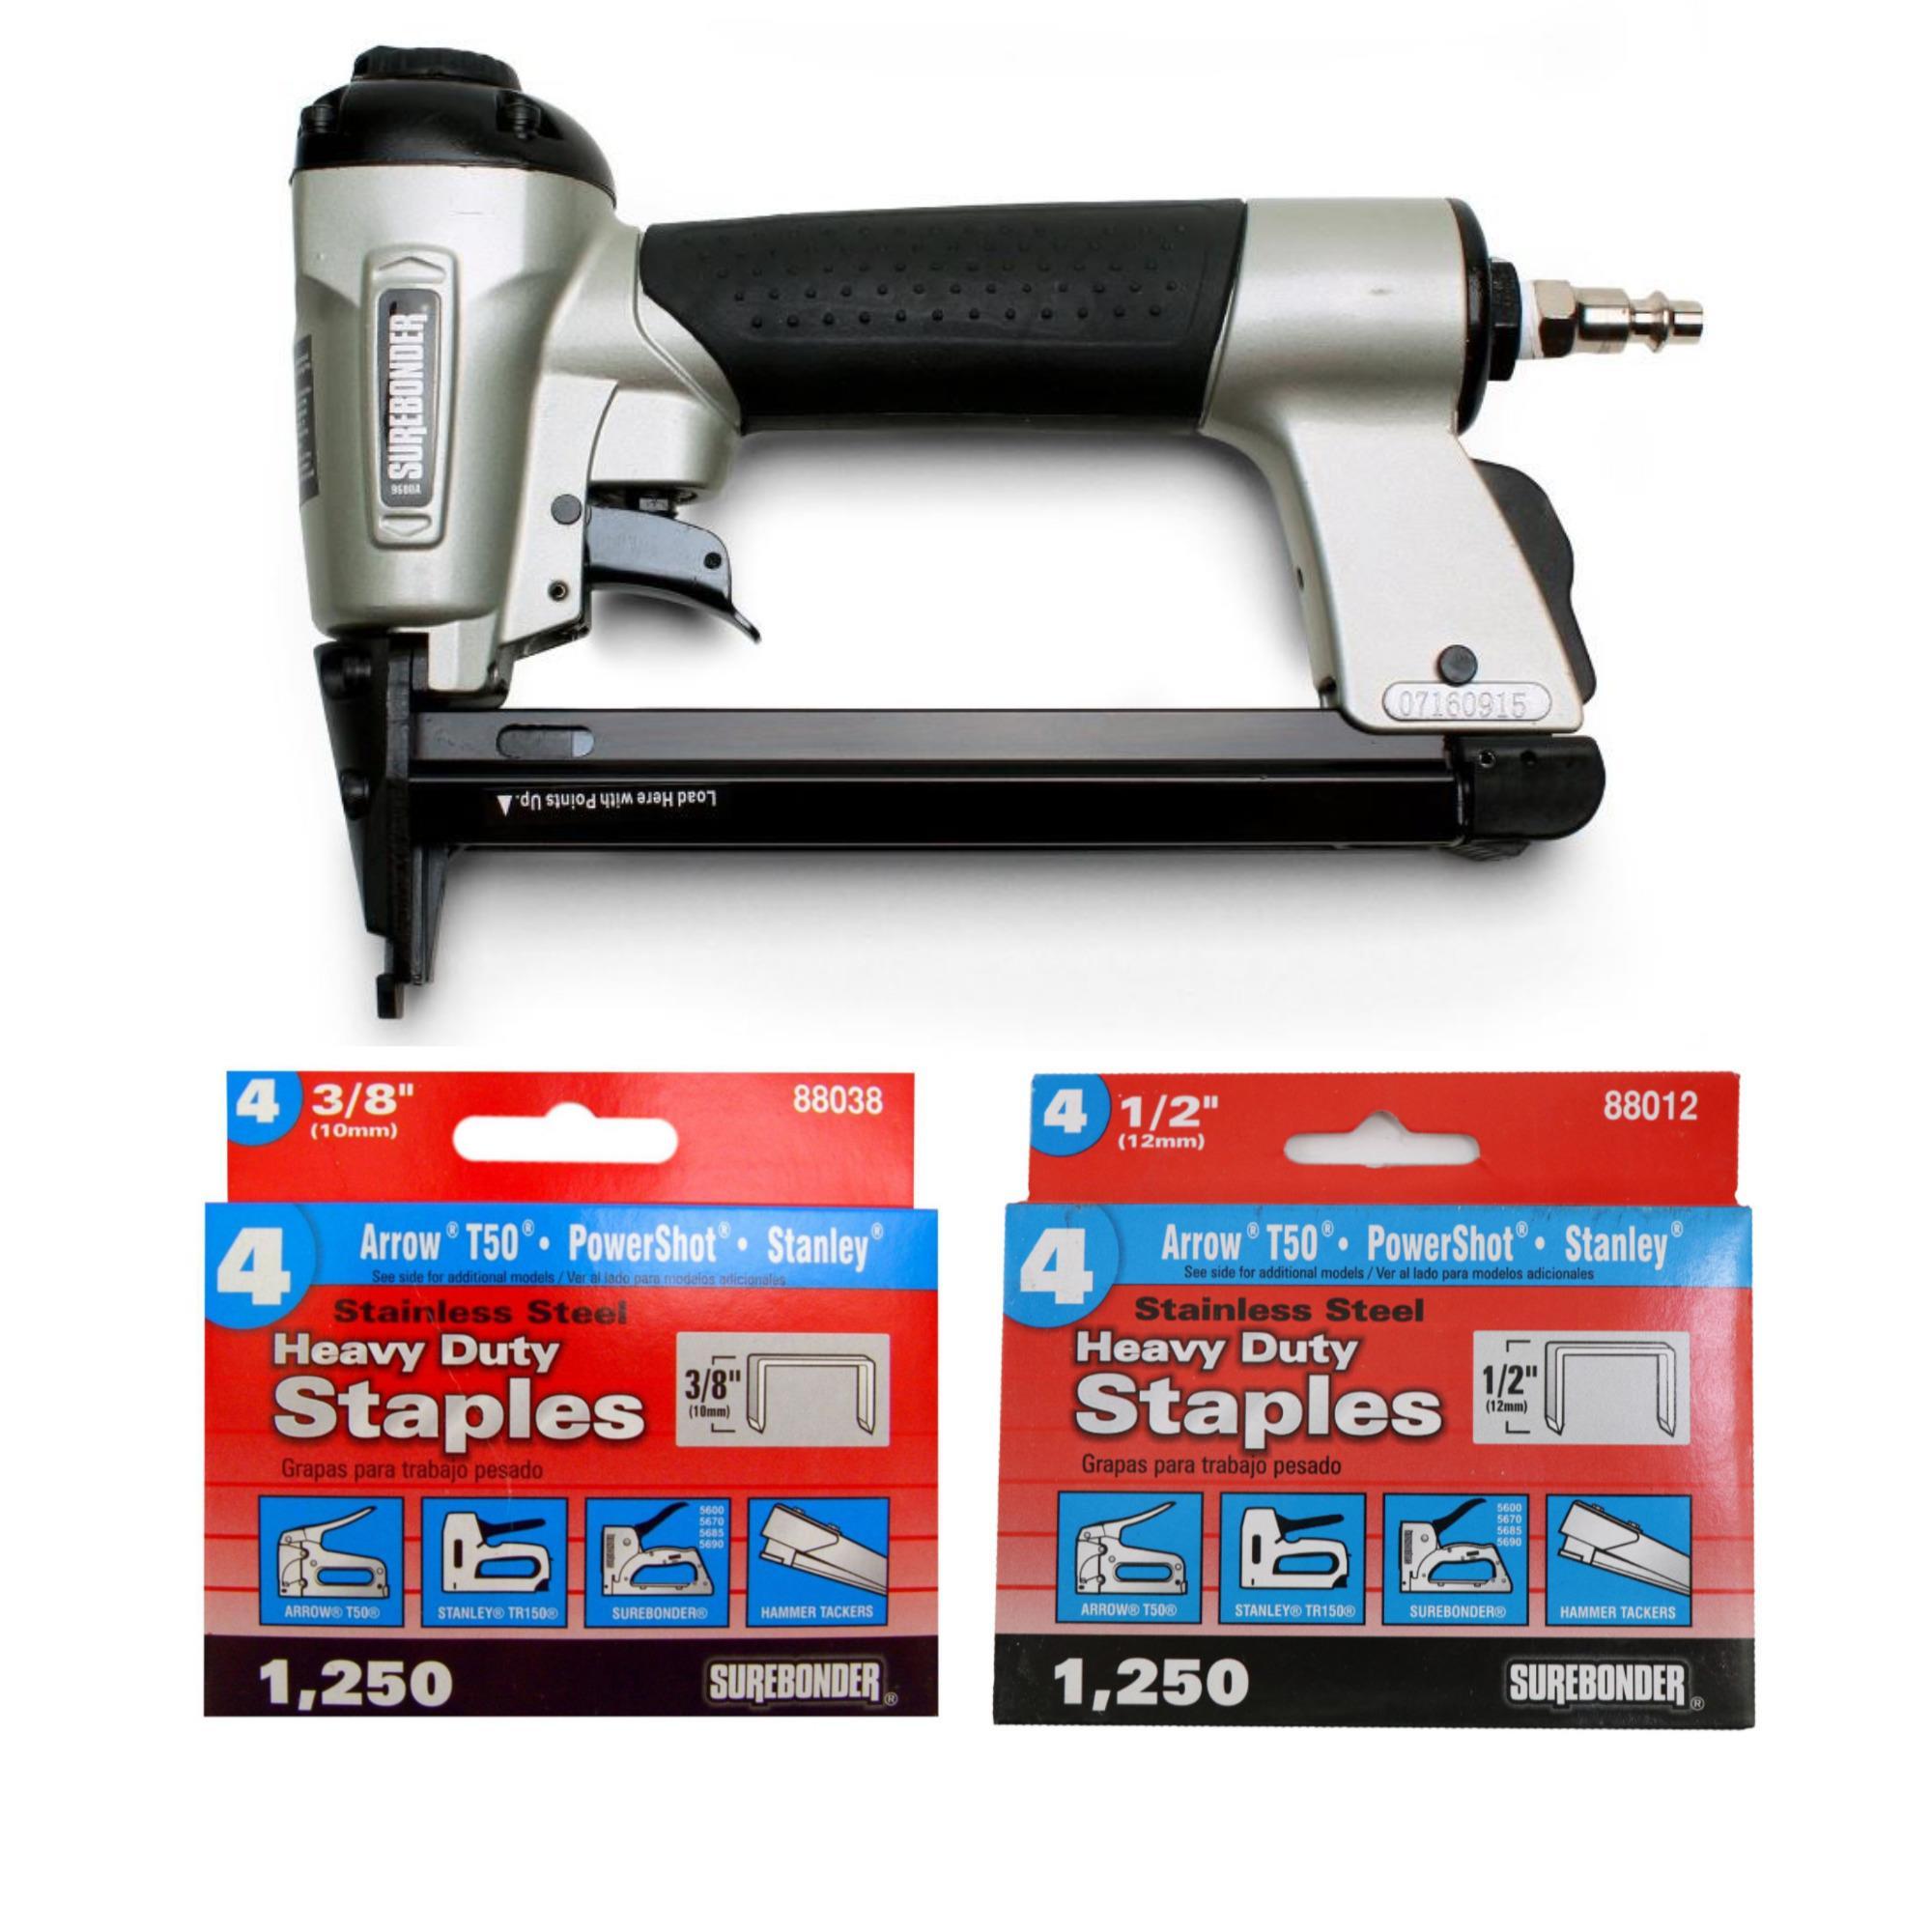 "Arrow T50 Stanley Powershot Staple Guns Steel Staples Sizes 1//4 /& 5//16/"" 9600"